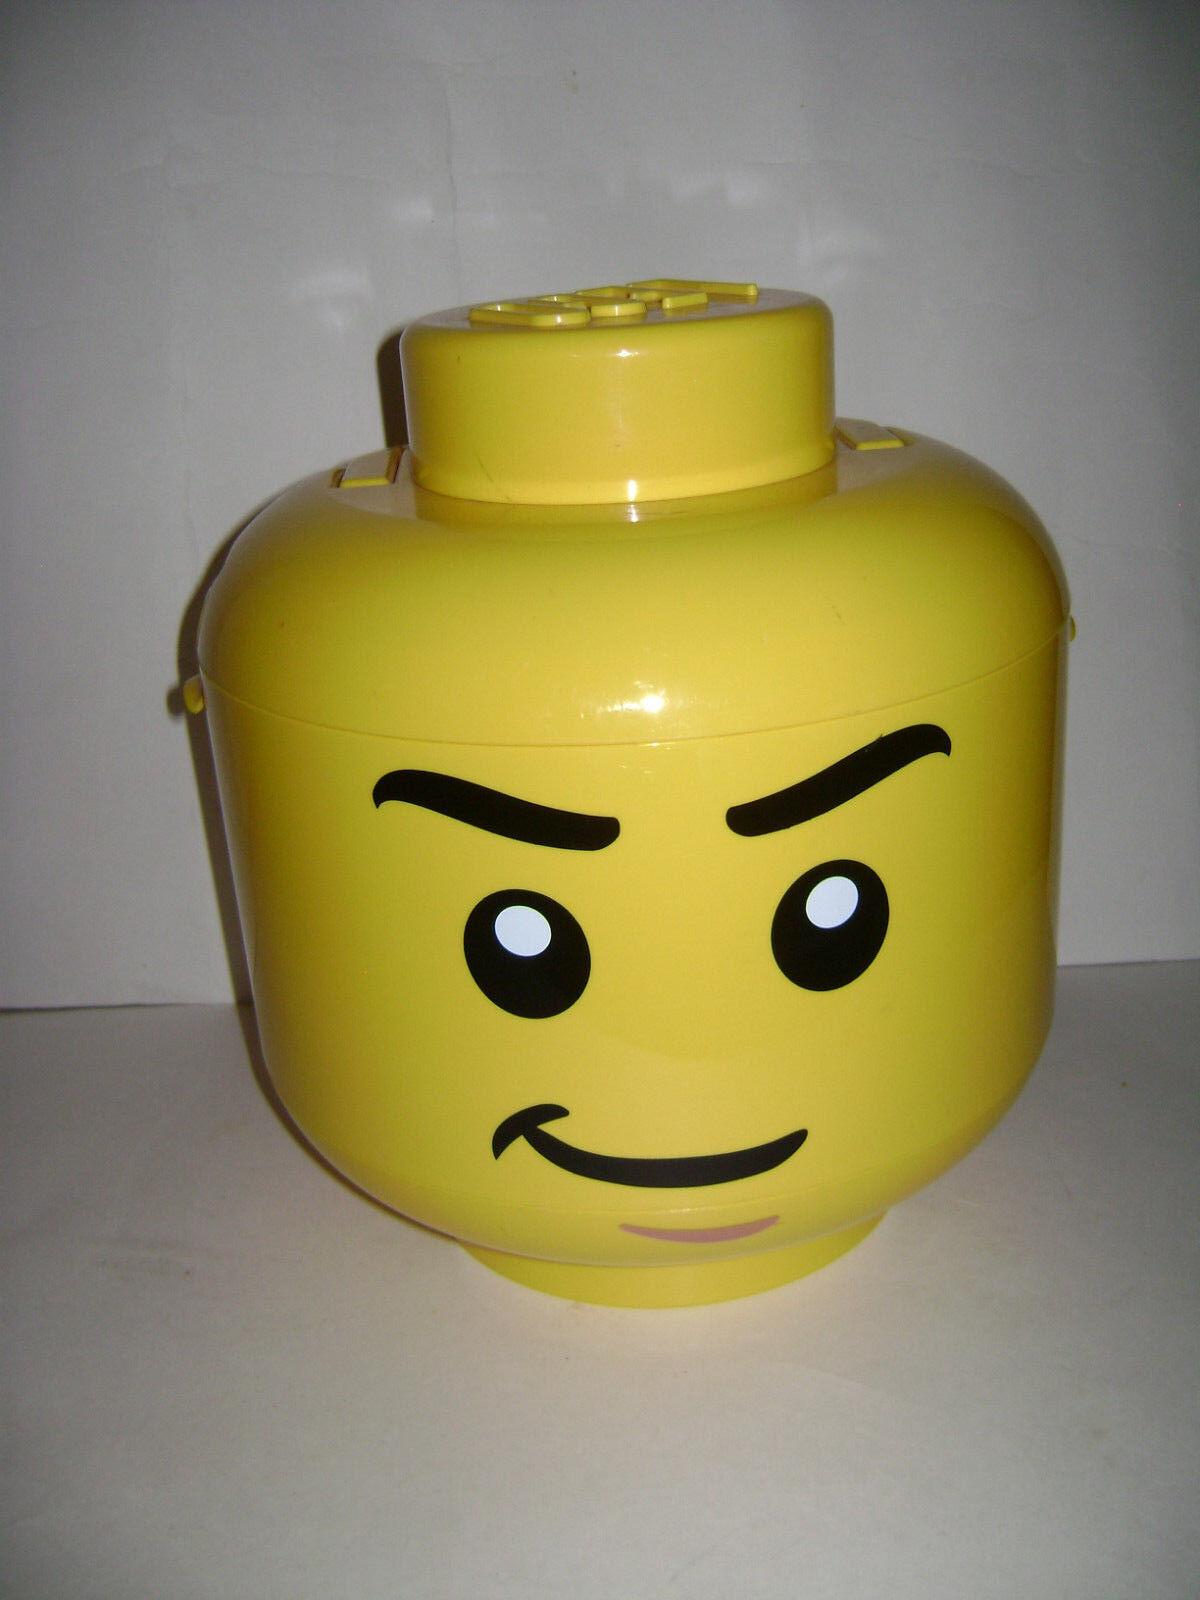 LEGO 2010 Sort Store Sorter Large Gelb Storage Head Bin w/ Grids CASE RETIROT